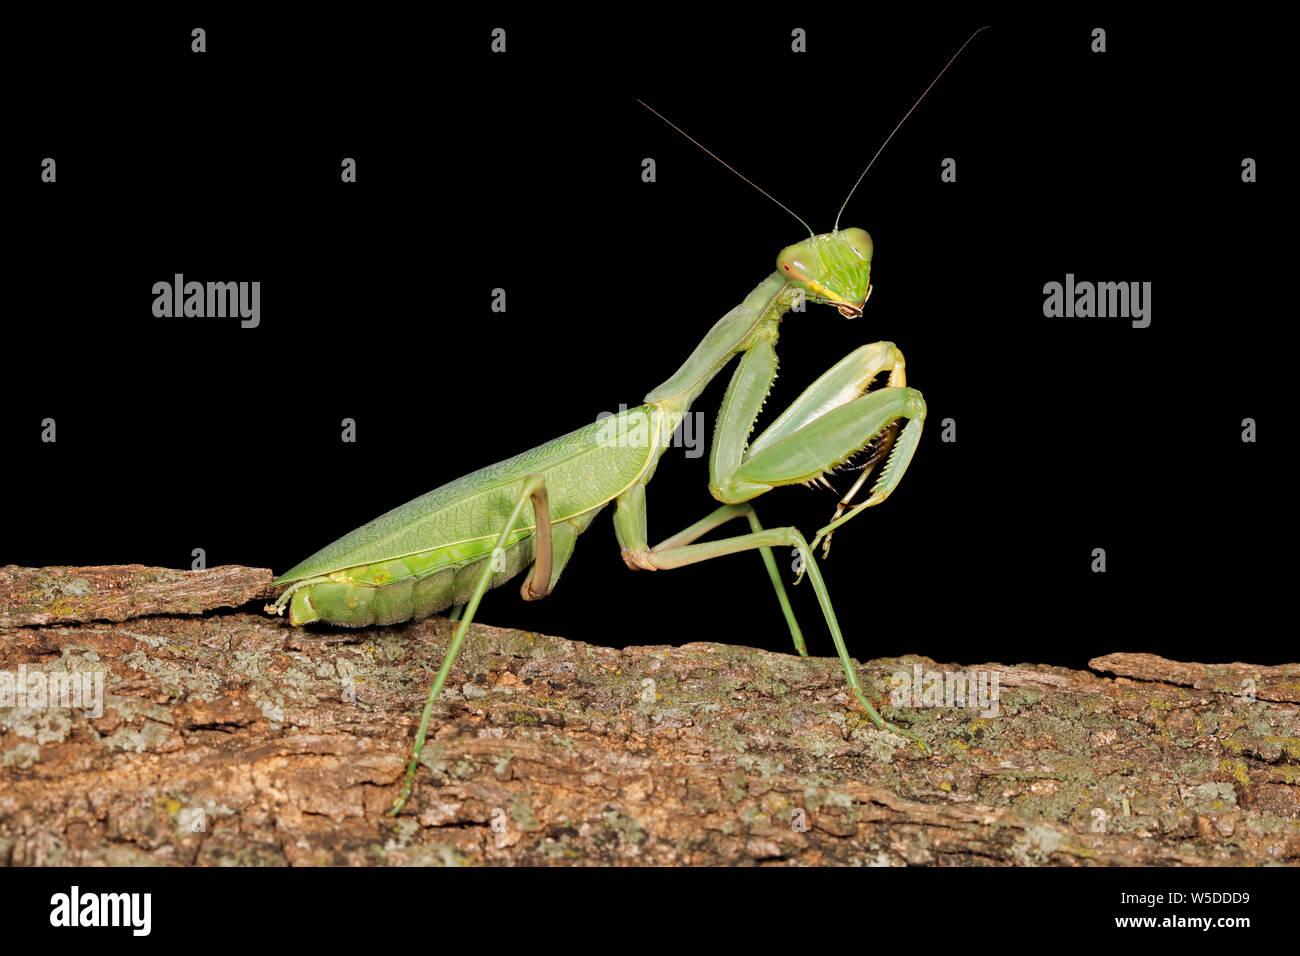 Common green mantis (Sphodromantis gastrica) on a branch, South Africa Stock Photo